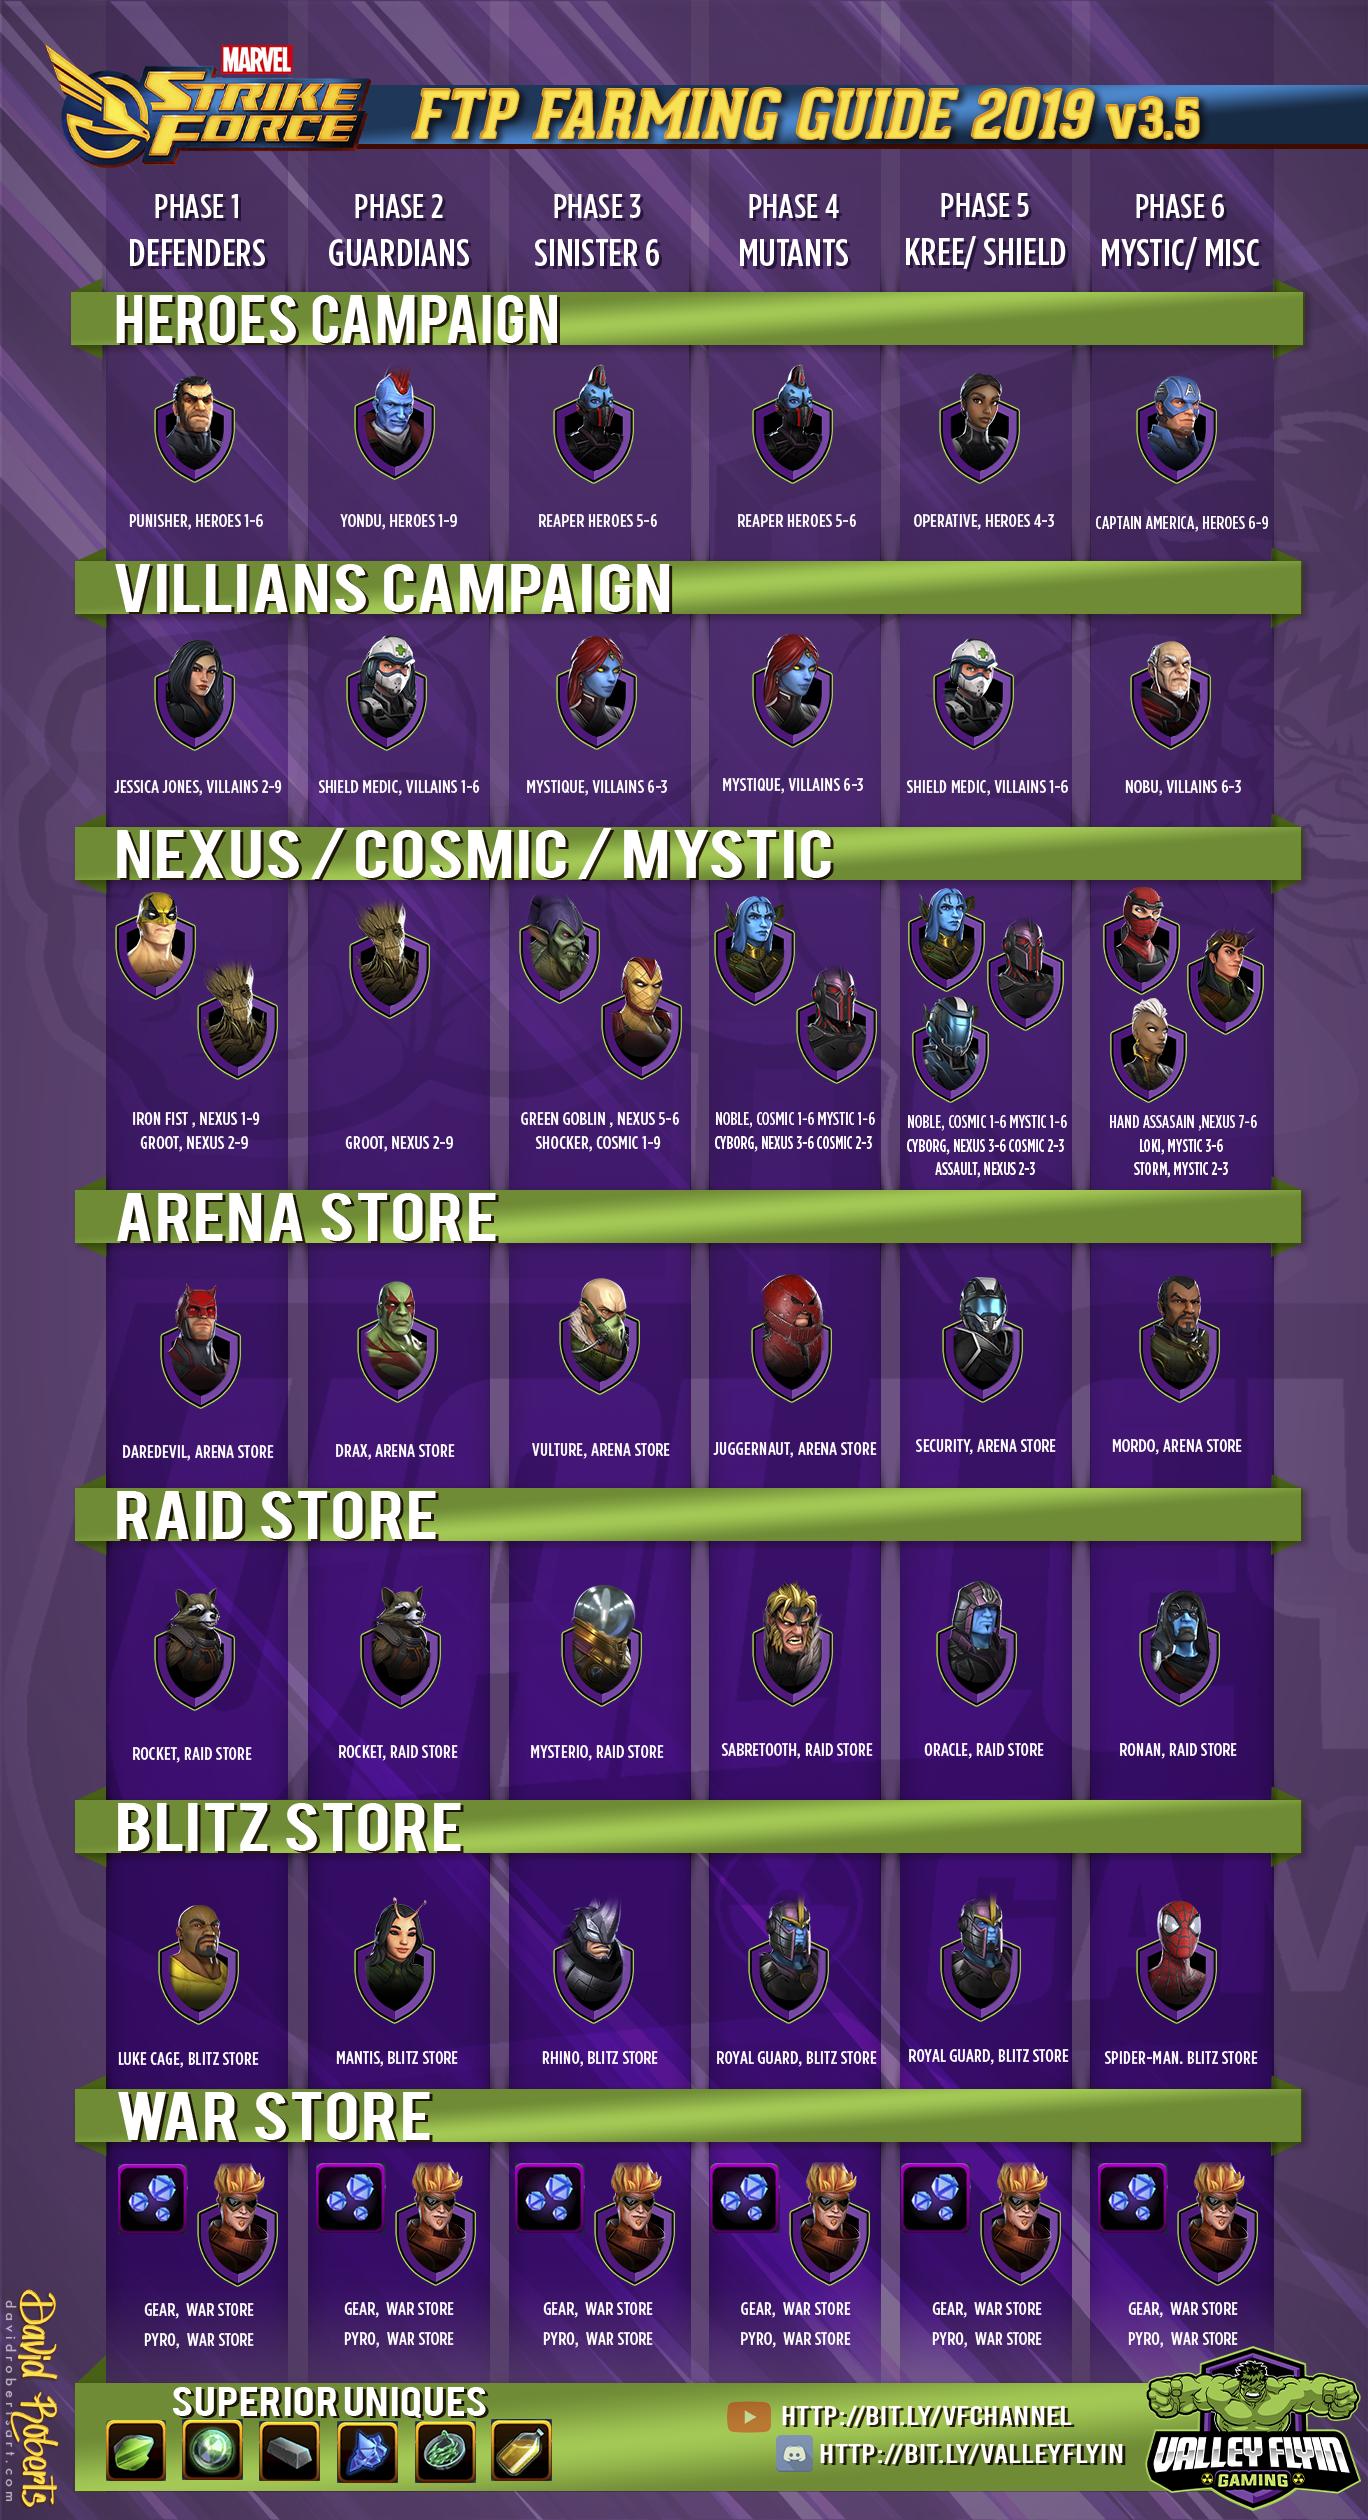 Ultimate Farming Guide V3 5 Marvelstrikeforce